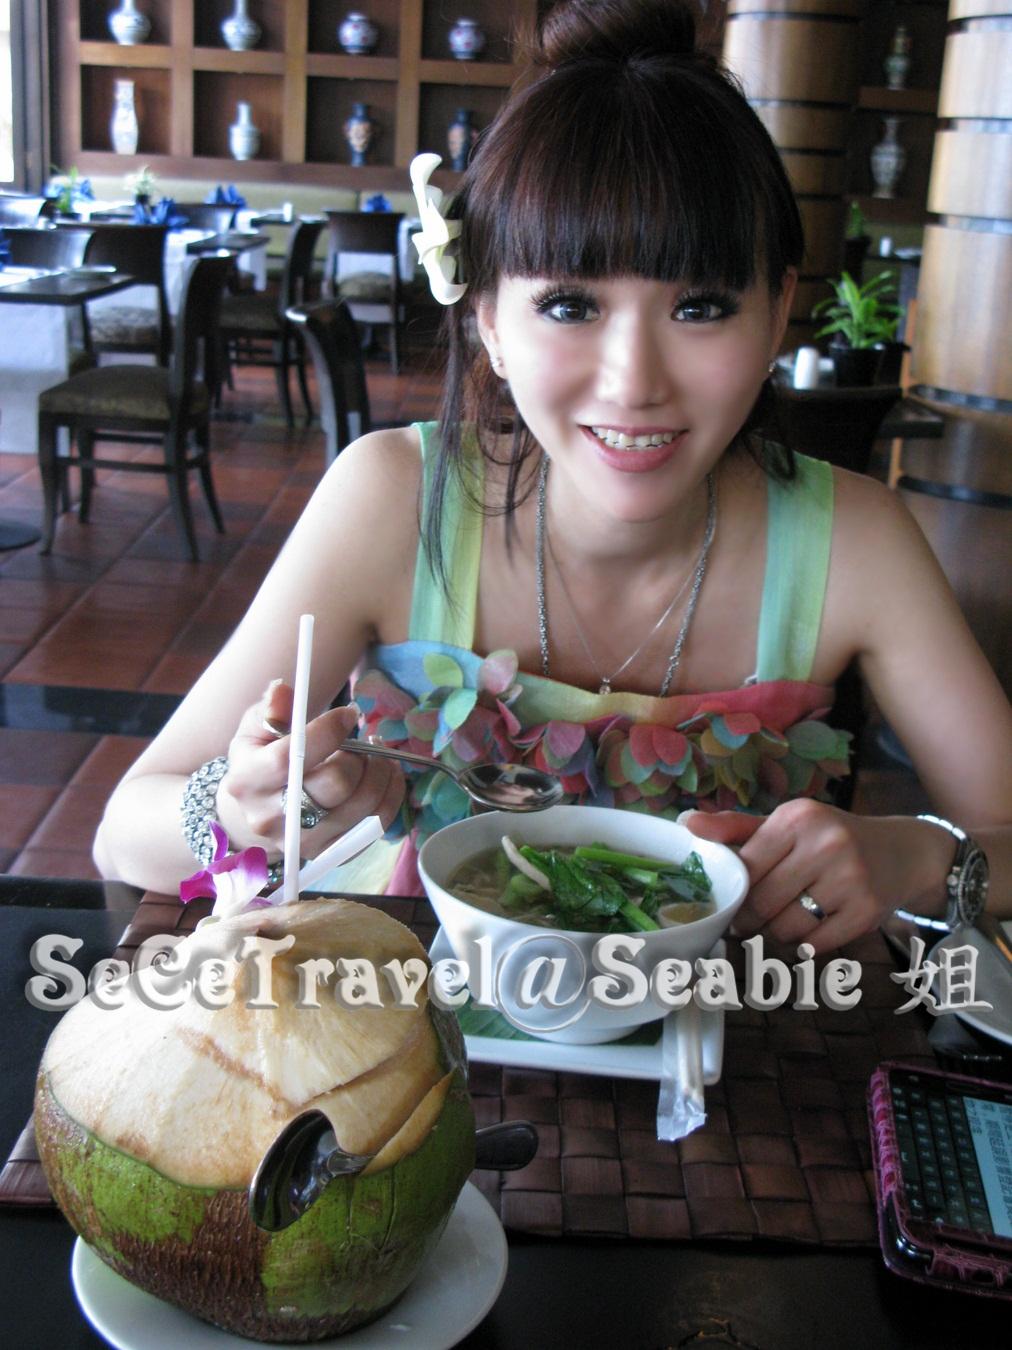 SeCeTravel-Seabie 姐